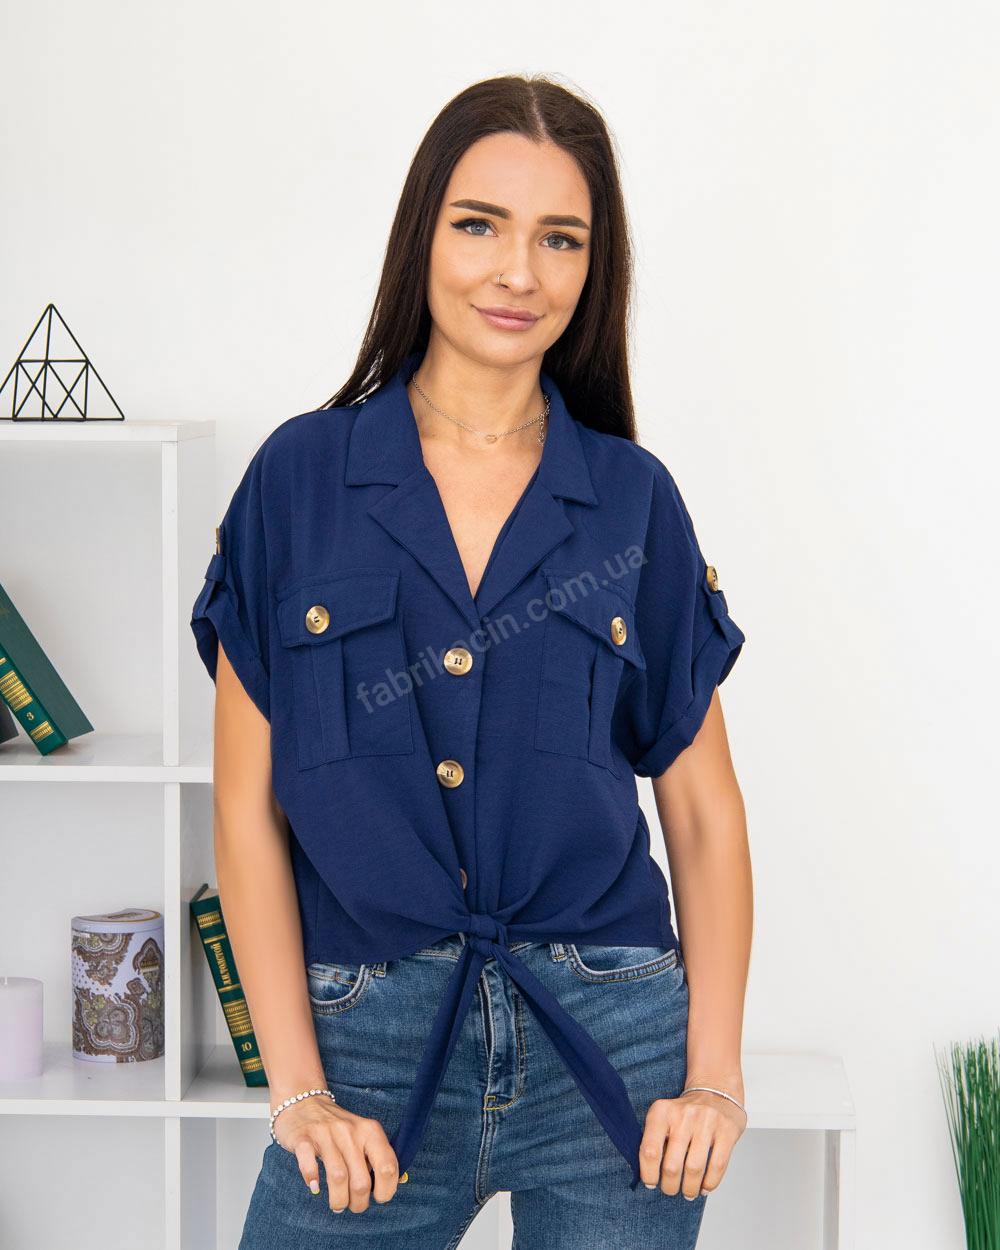 Блузка на пуговицах и завязке с карманами р-р: 50 - 54 цвет: синий - 1